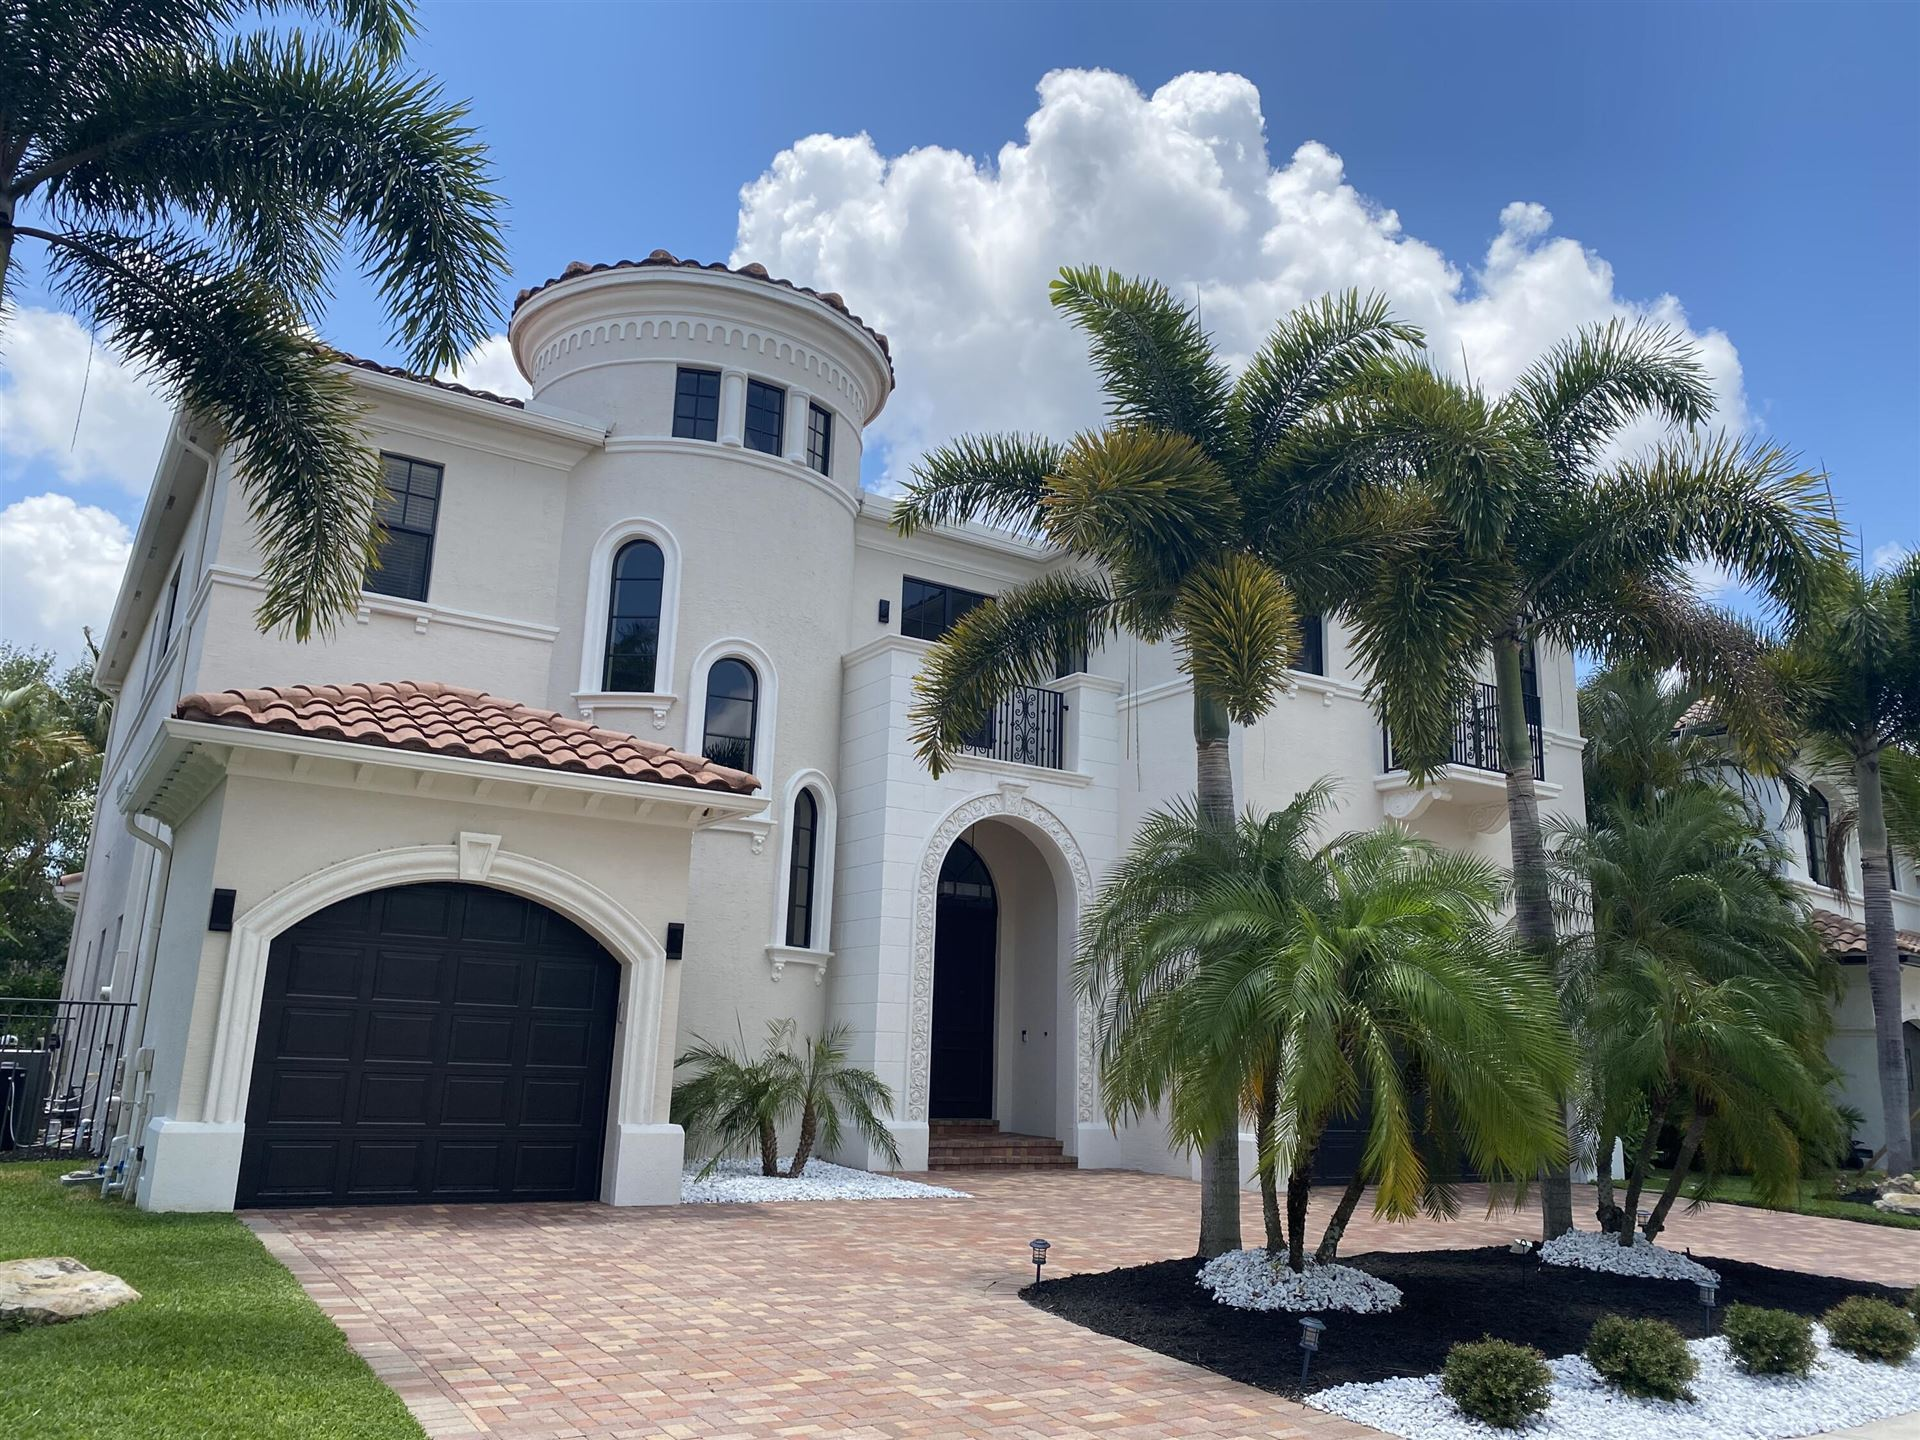 17897 Monte Vista Drive, Boca Raton, FL 33496 - MLS#: RX-10738977